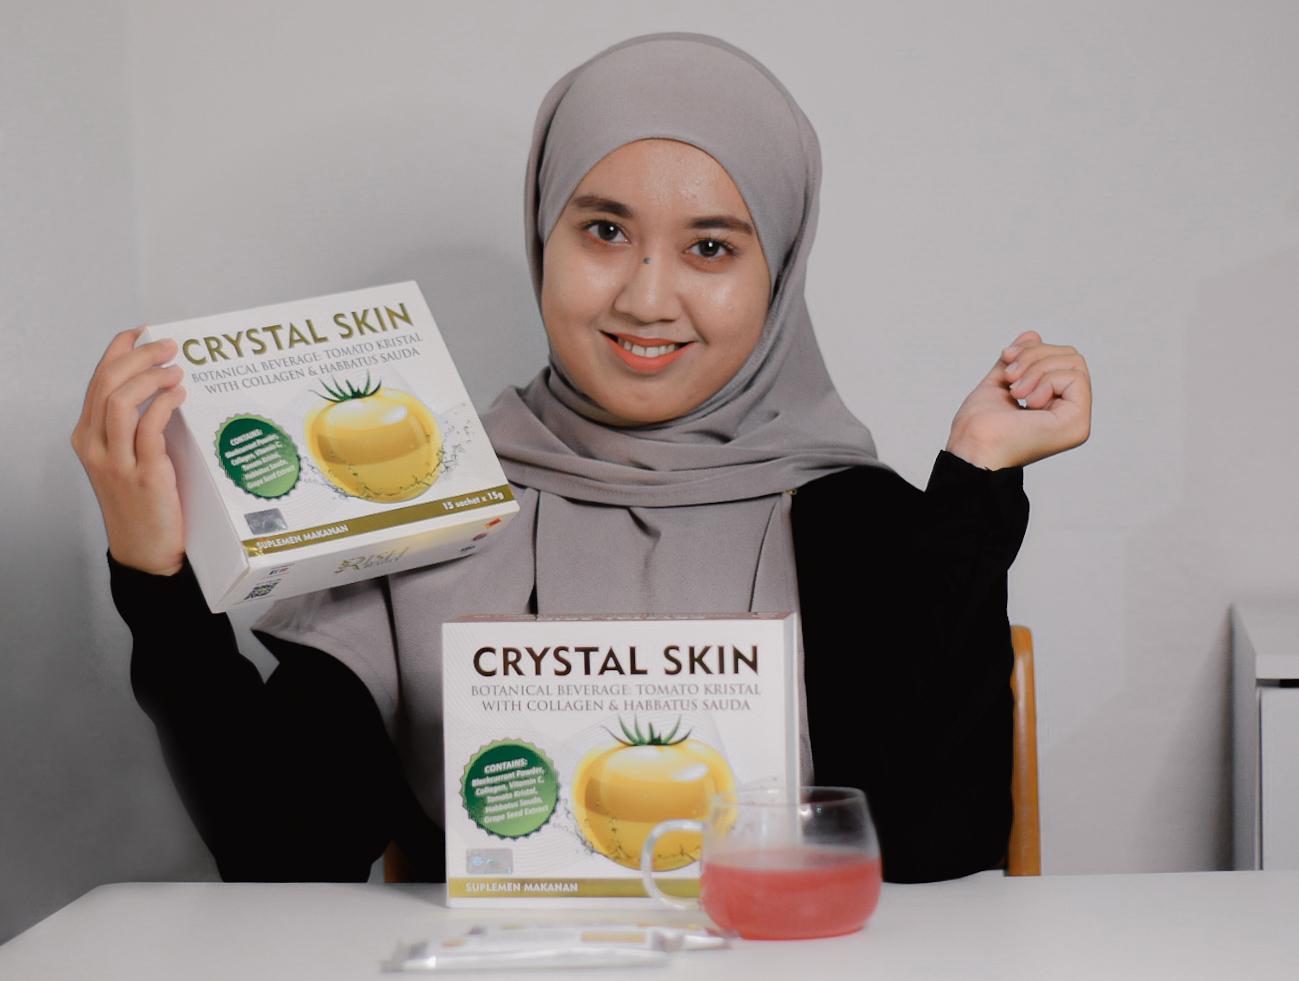 Crystal Skin Rish Beauty : Tomato Kristal dengan Collagen, Habbatus Sauda